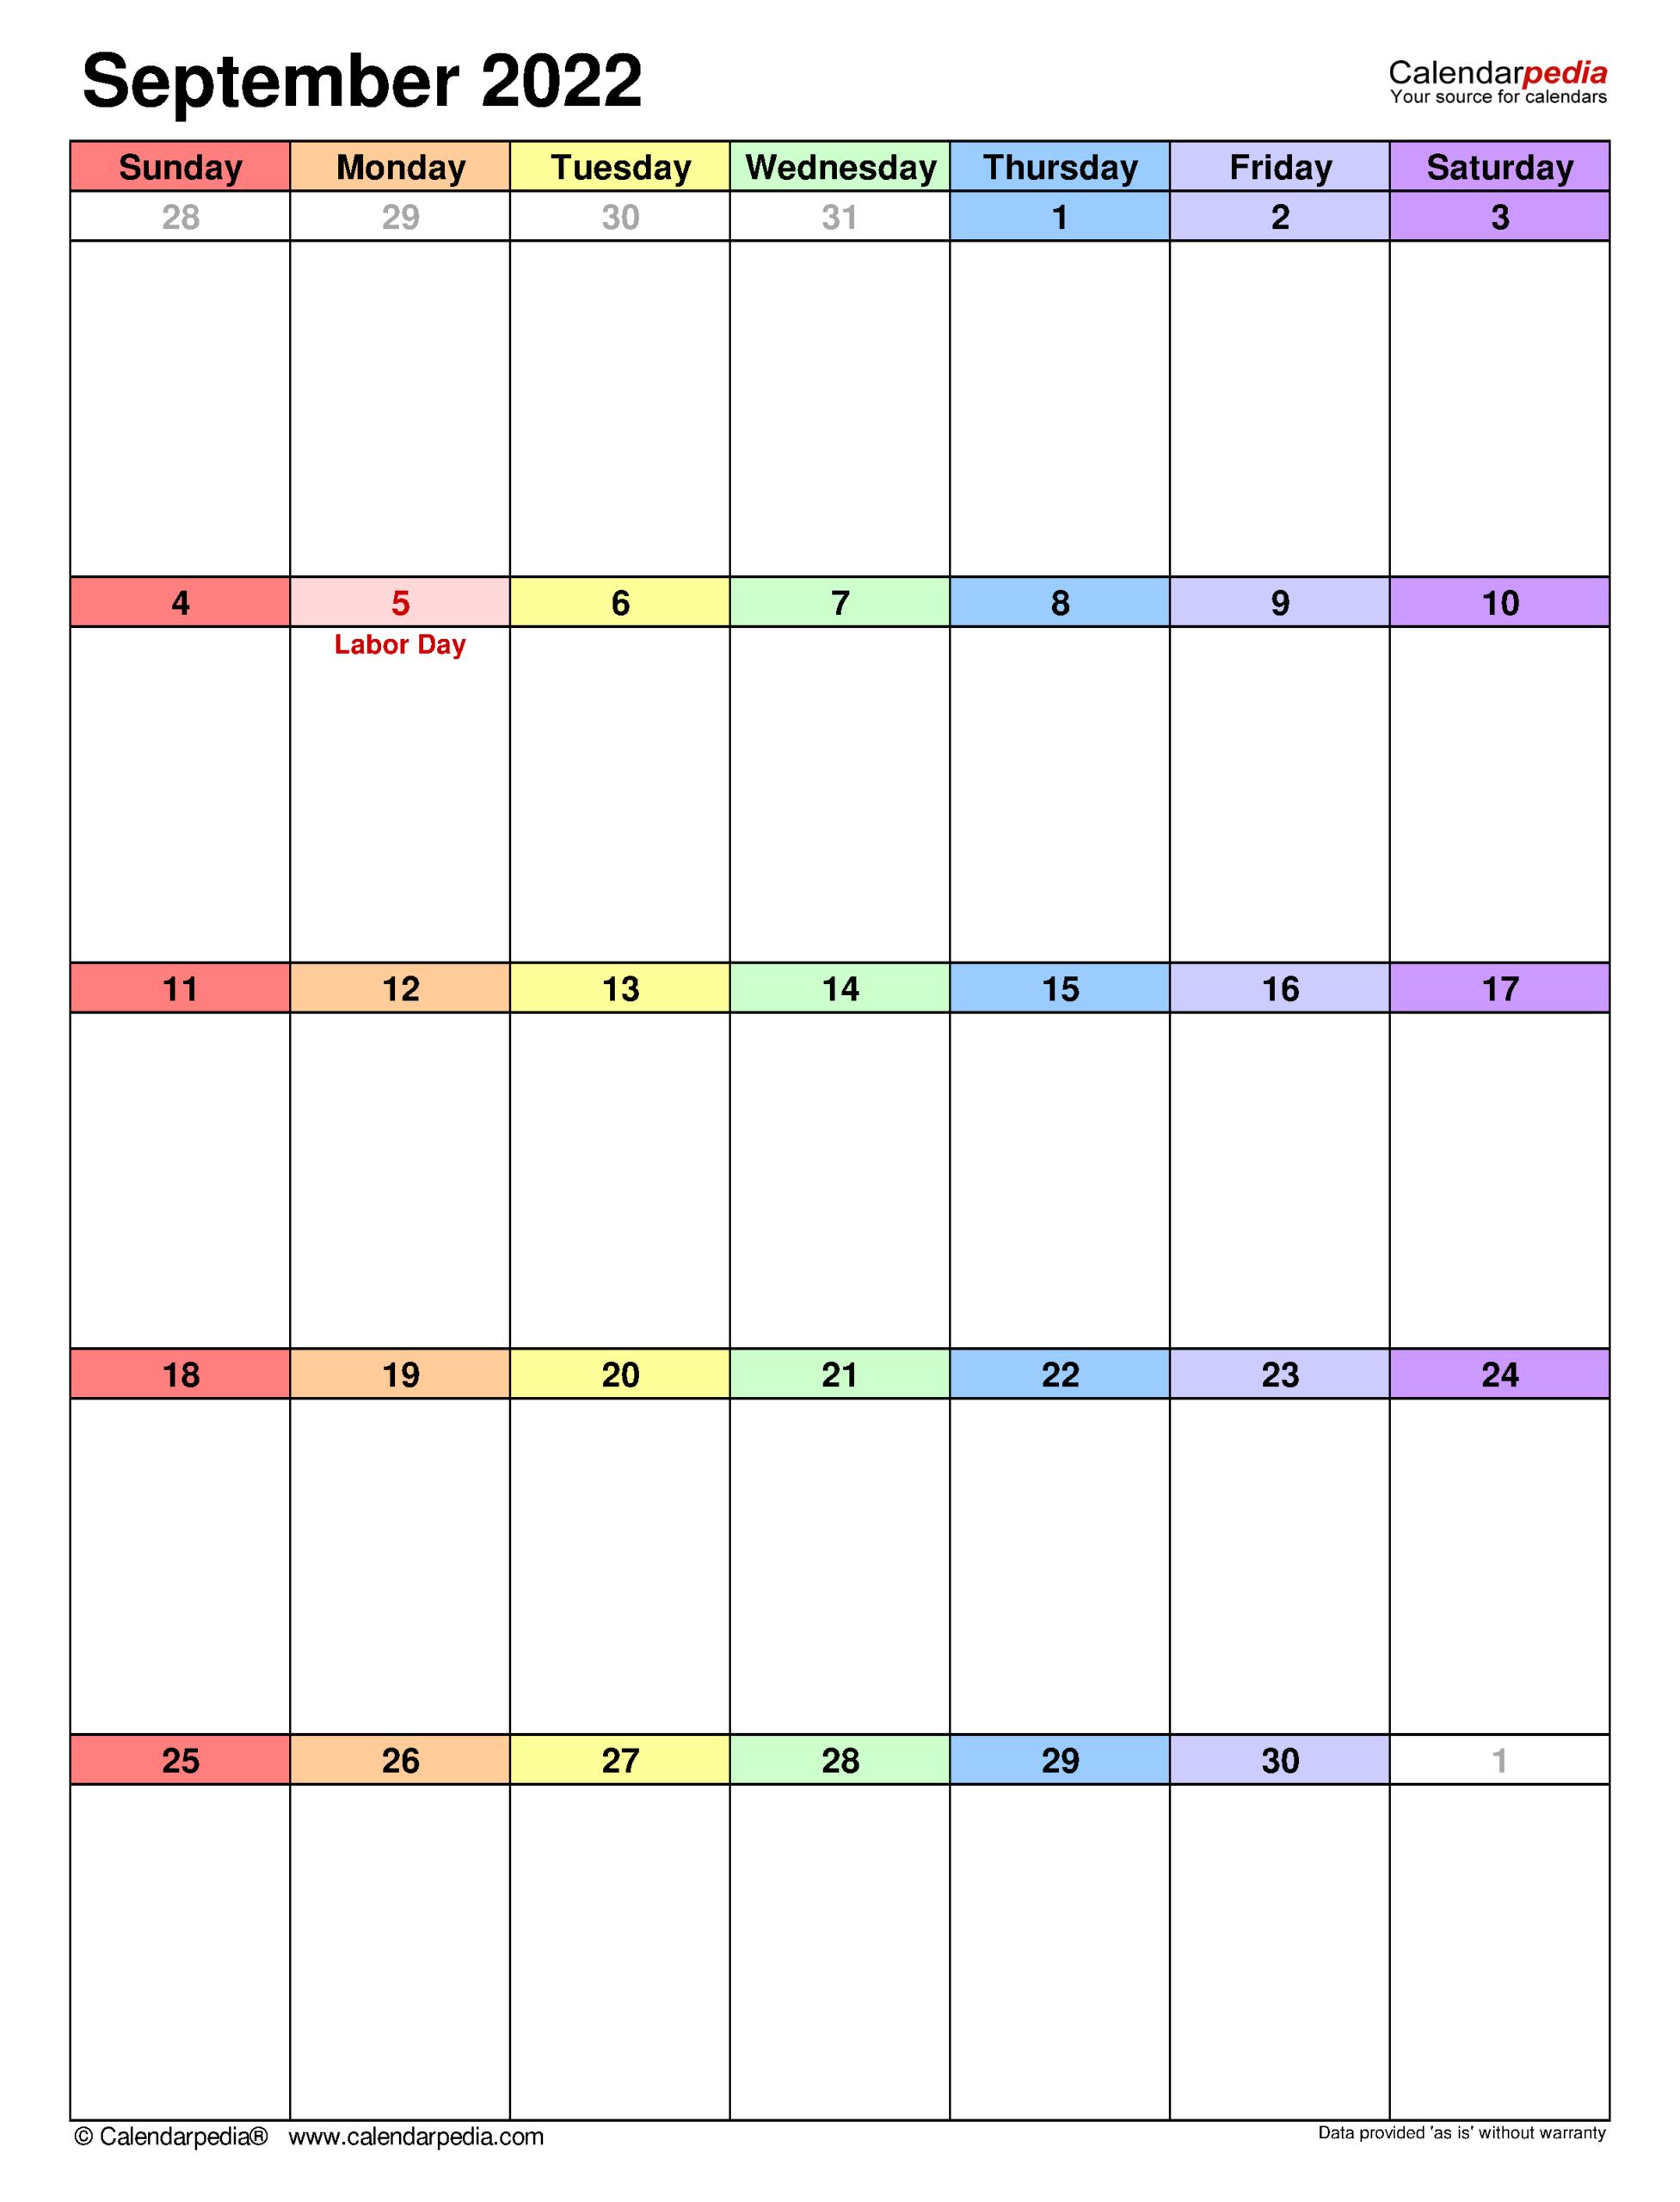 September 2022 Calendar | Templates For Word, Excel And Pdf throughout Print Month Calendar September 2022